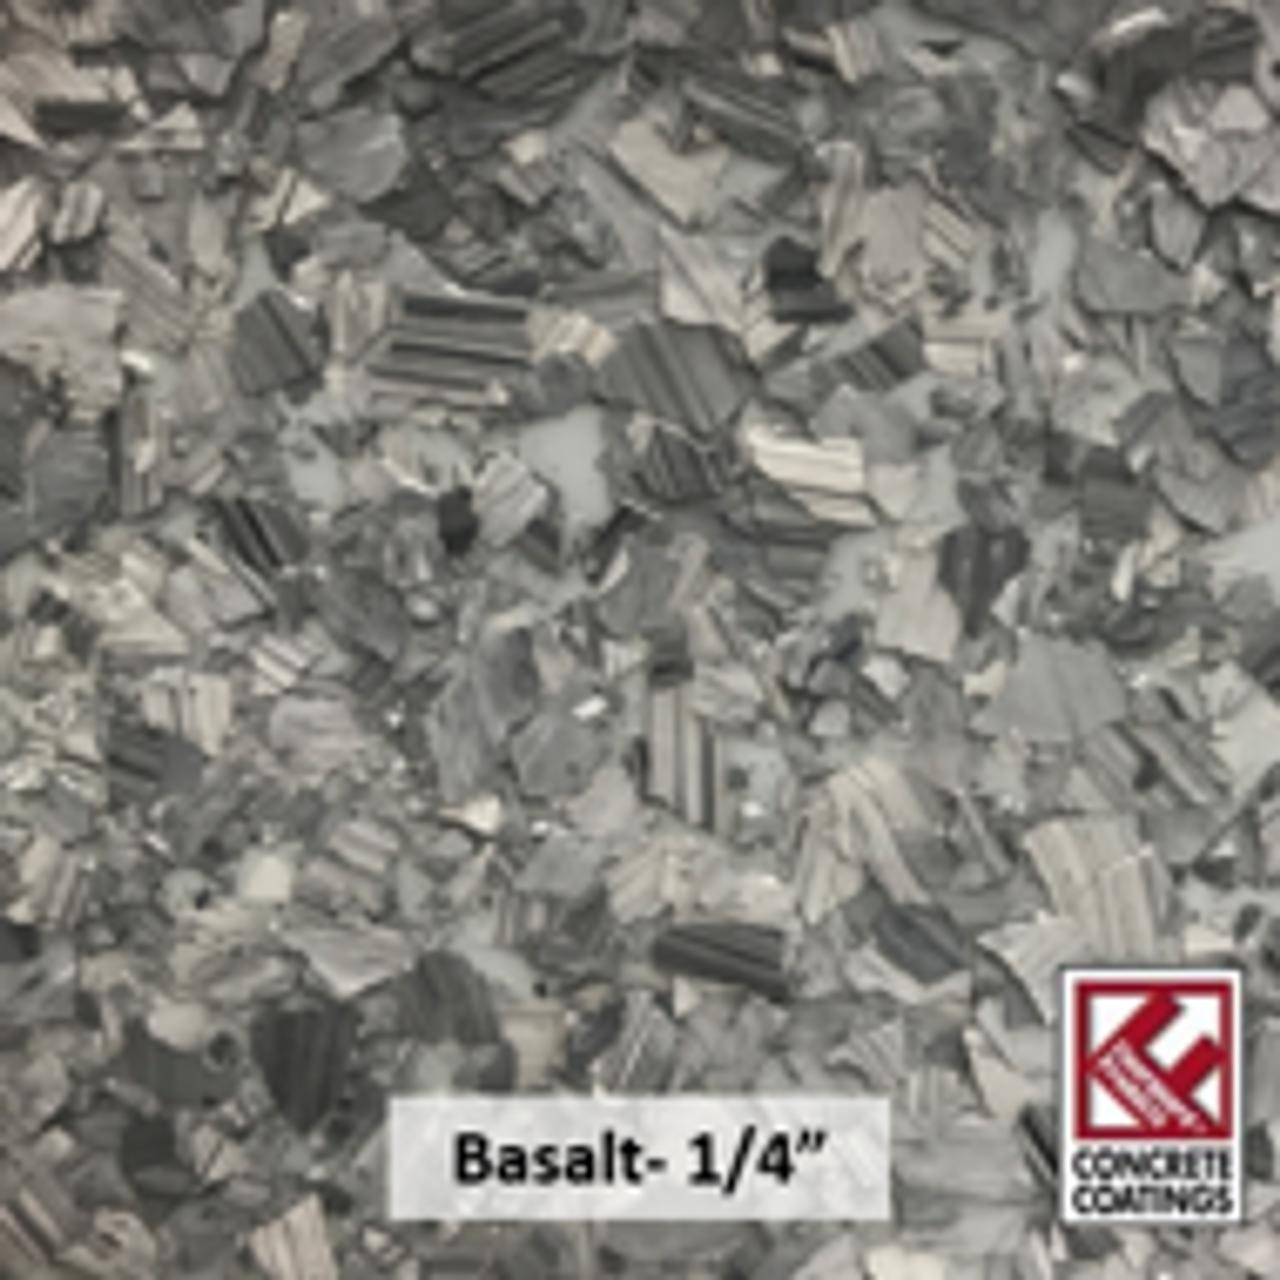 "Basalt- Chipped Stone Flake- 1/4"" (40 lb.)"